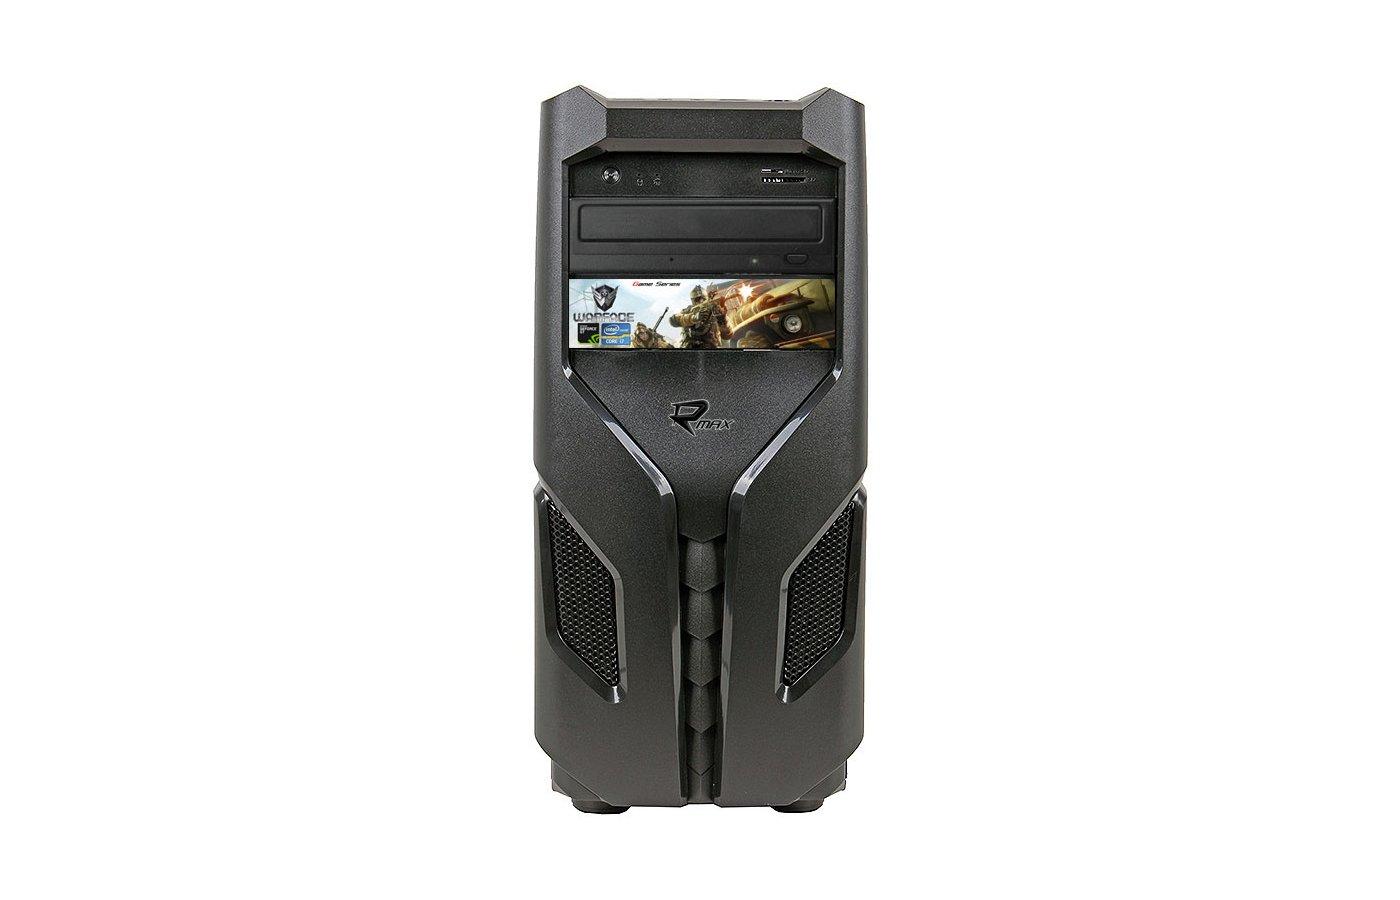 Системный блок Rmax 706 Gaming Pro intel i7 620M 2.6Gh/8Gb/1Tb/GT740 2Gb/DVDRW/DOS